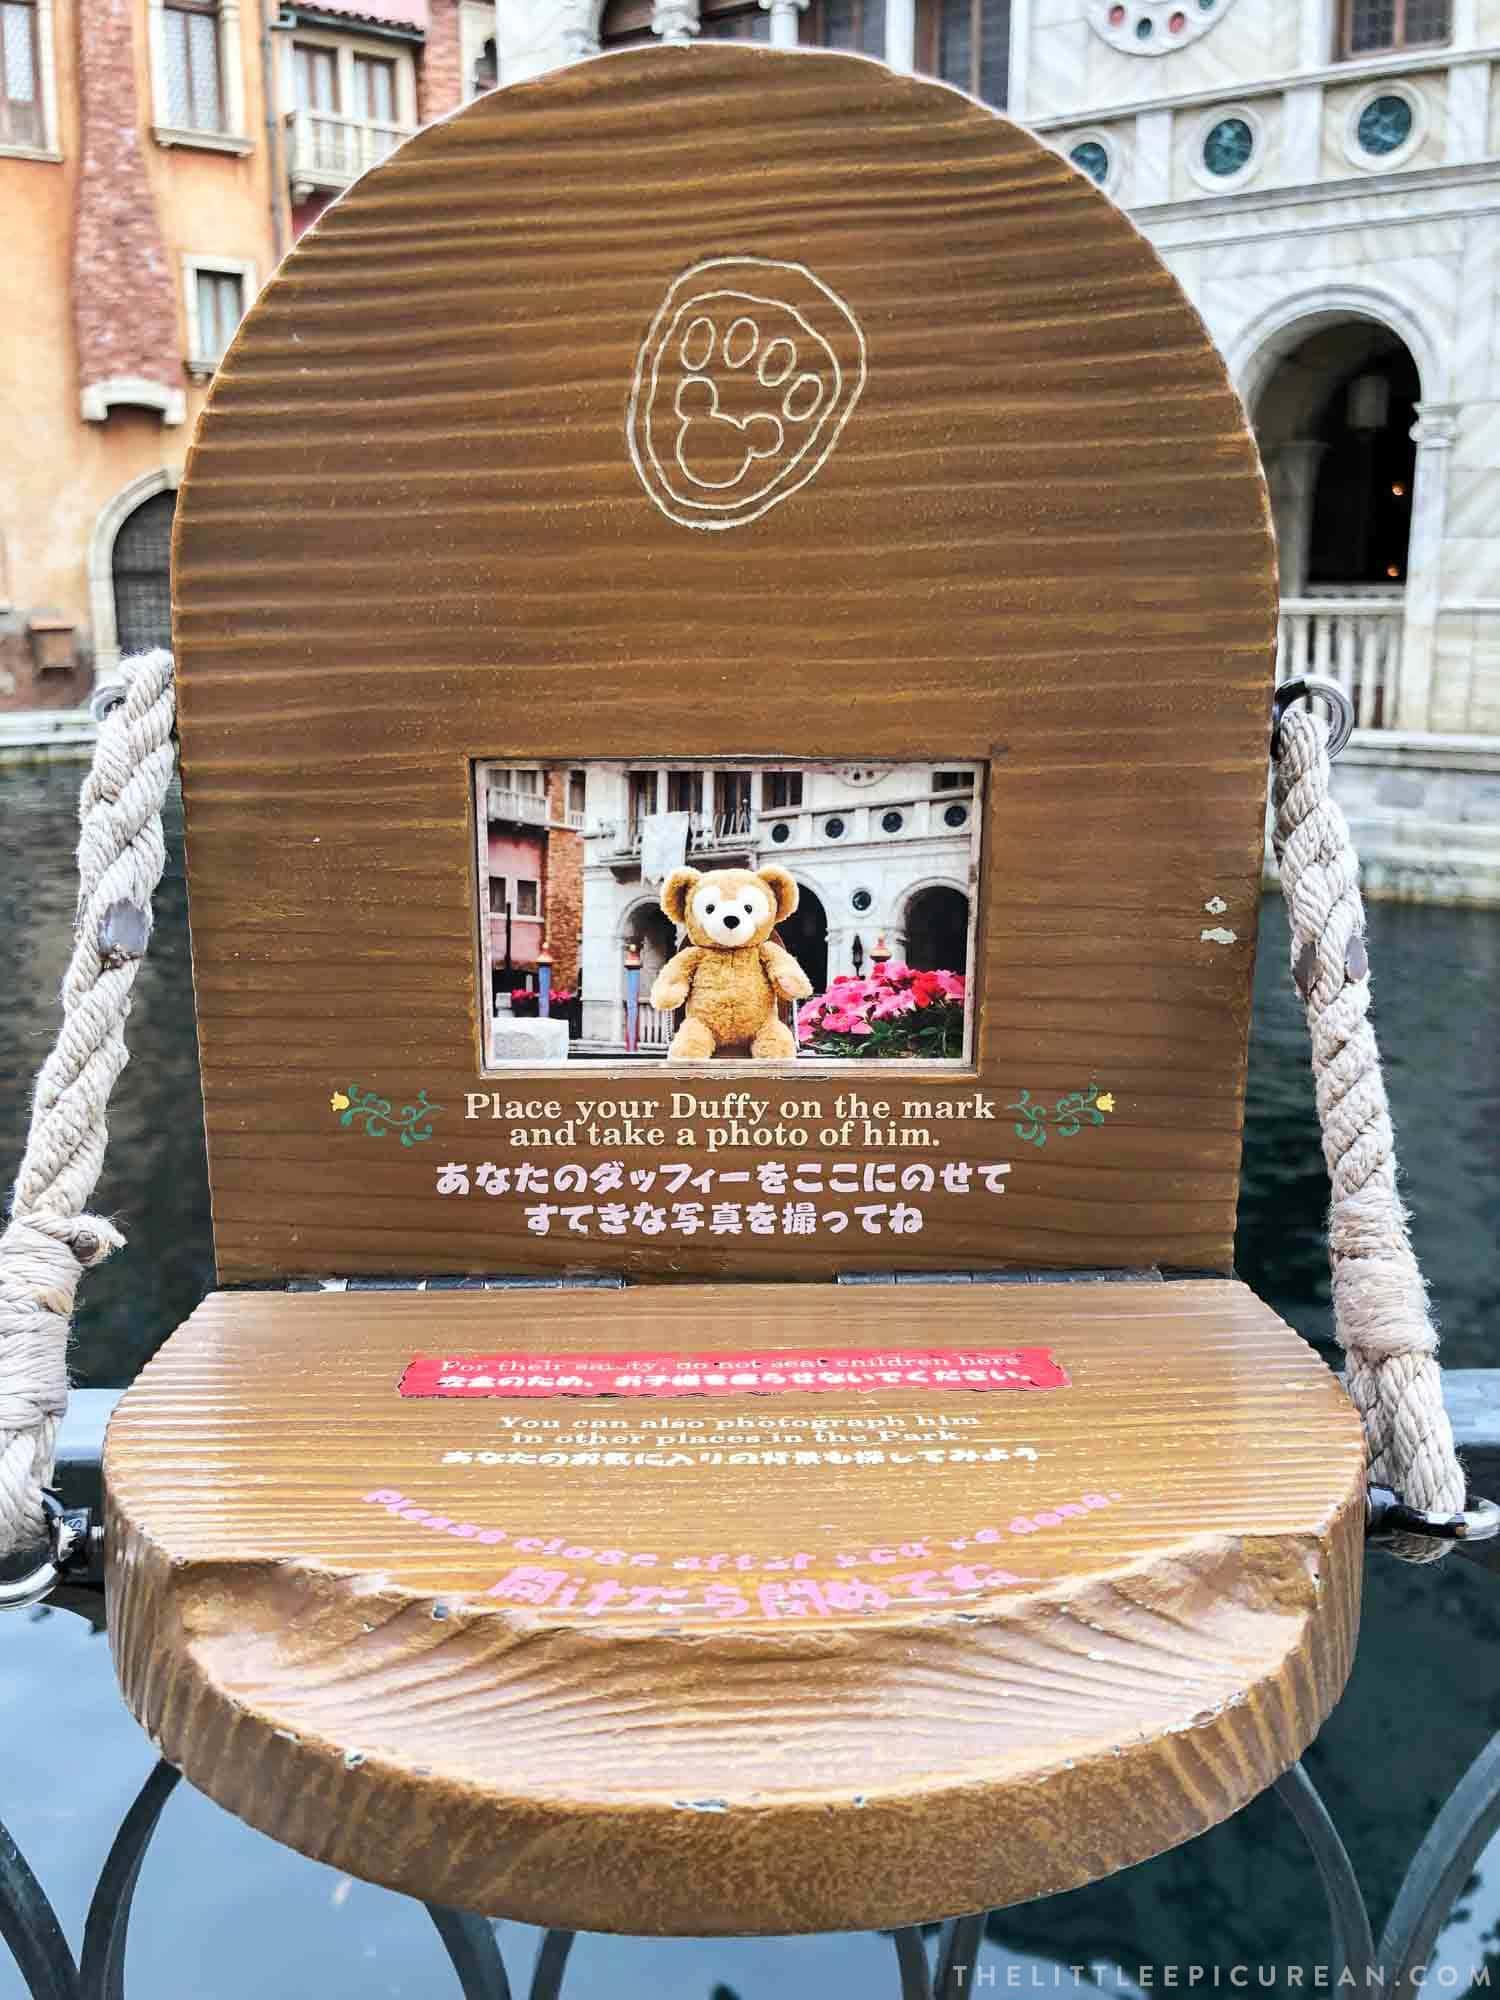 Who is Duffy? Tokyo DisneySea teddy bear